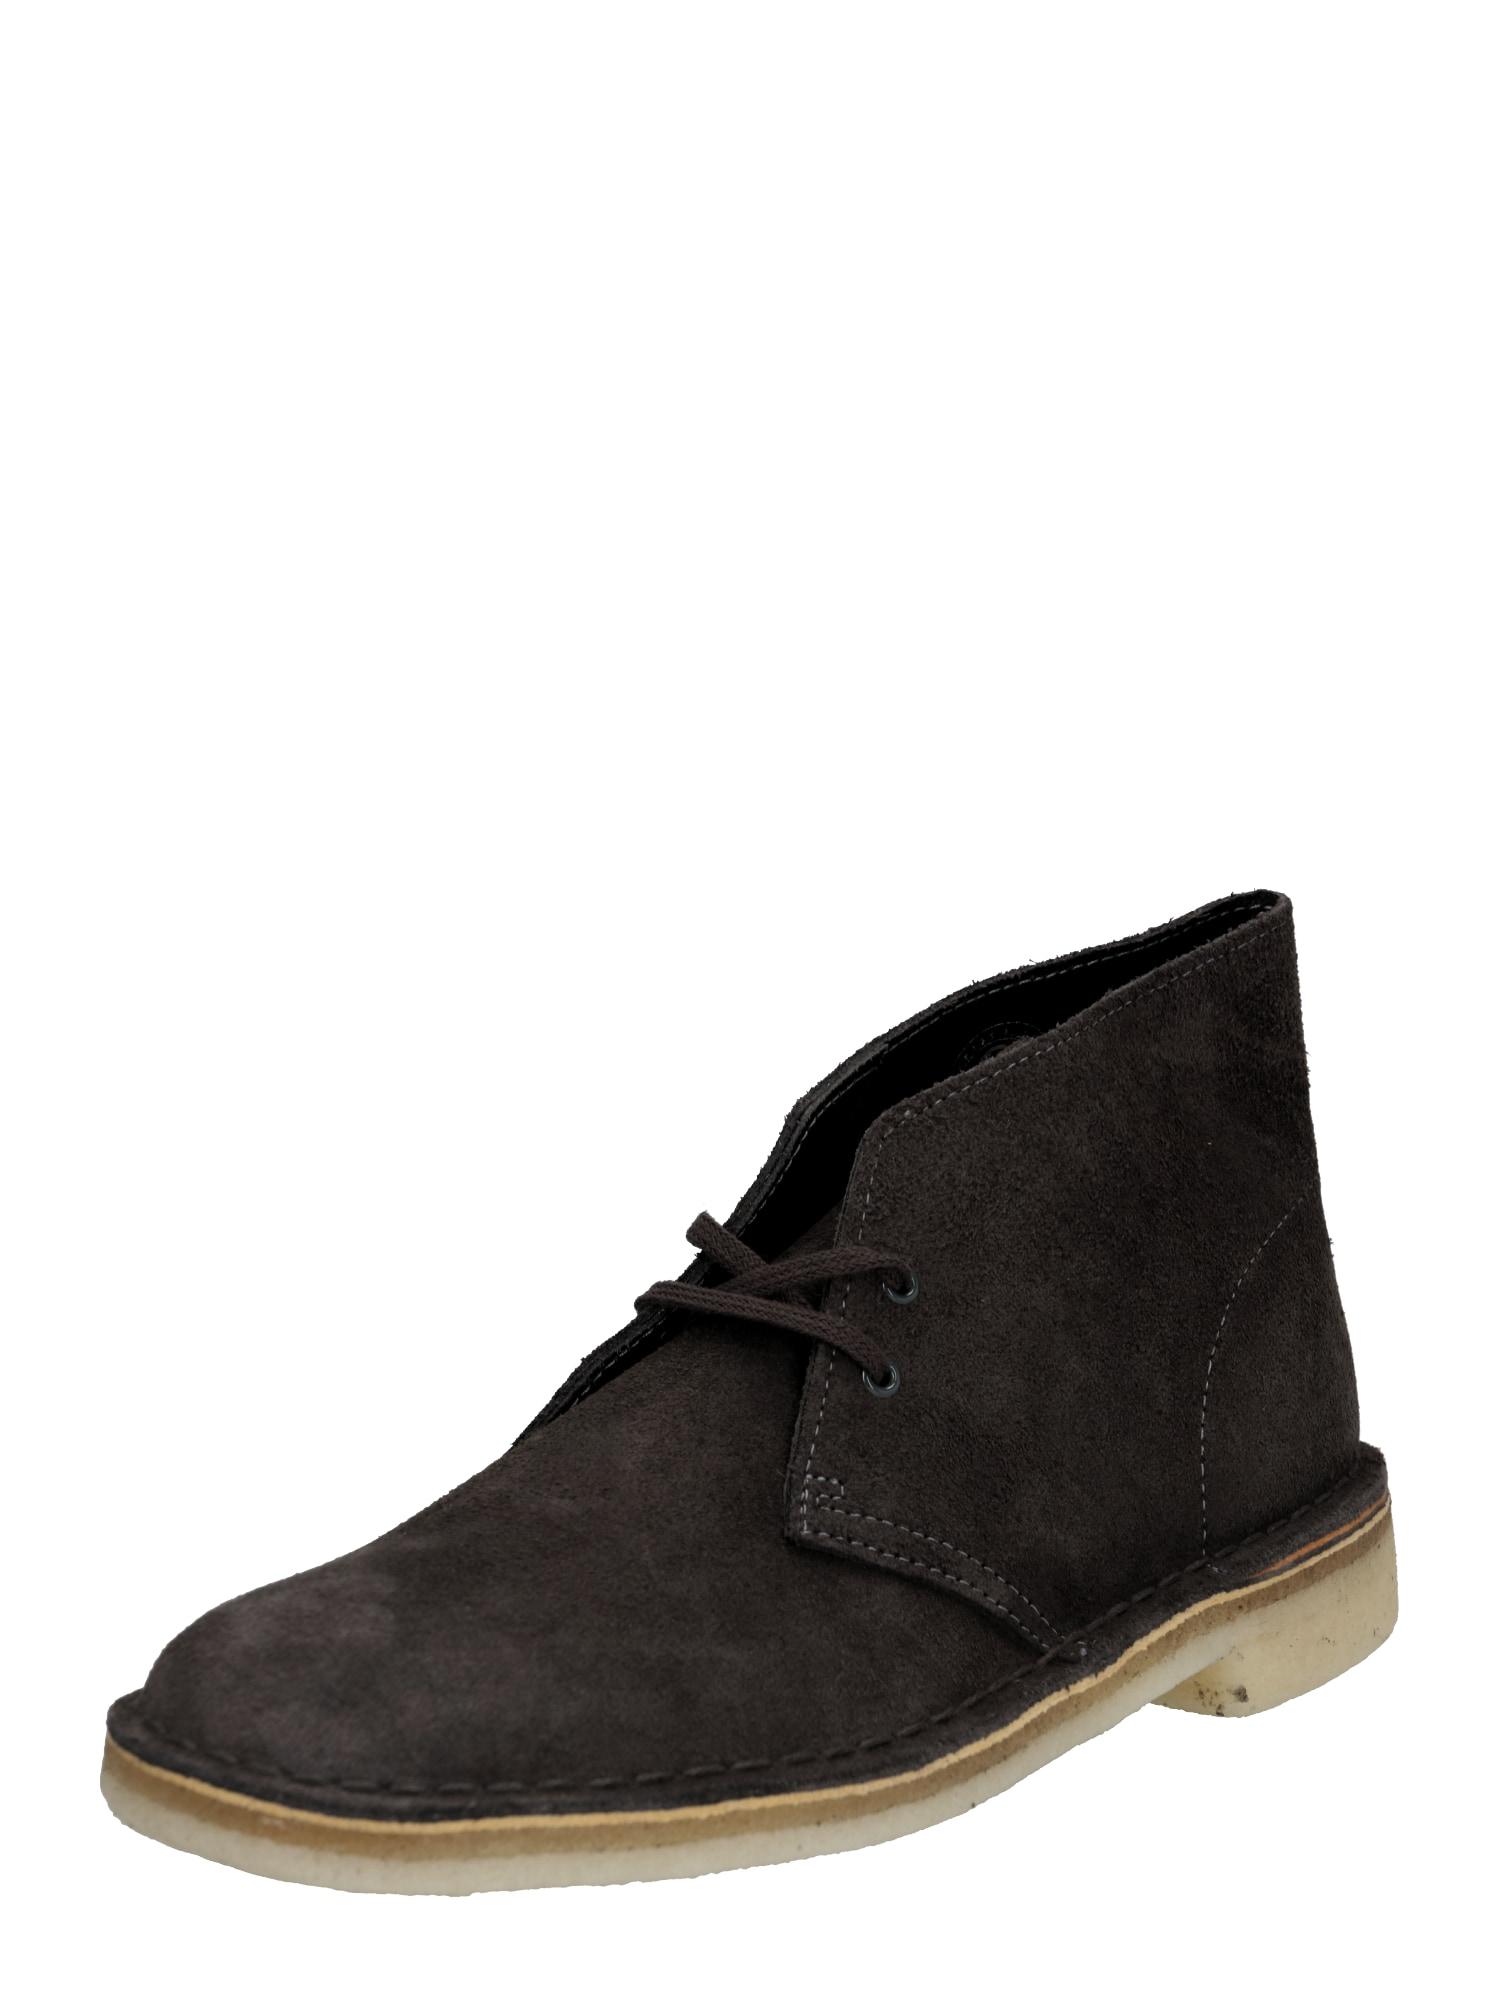 Šněrovací boty DESERT BOOT tmavě šedá Clarks Originals